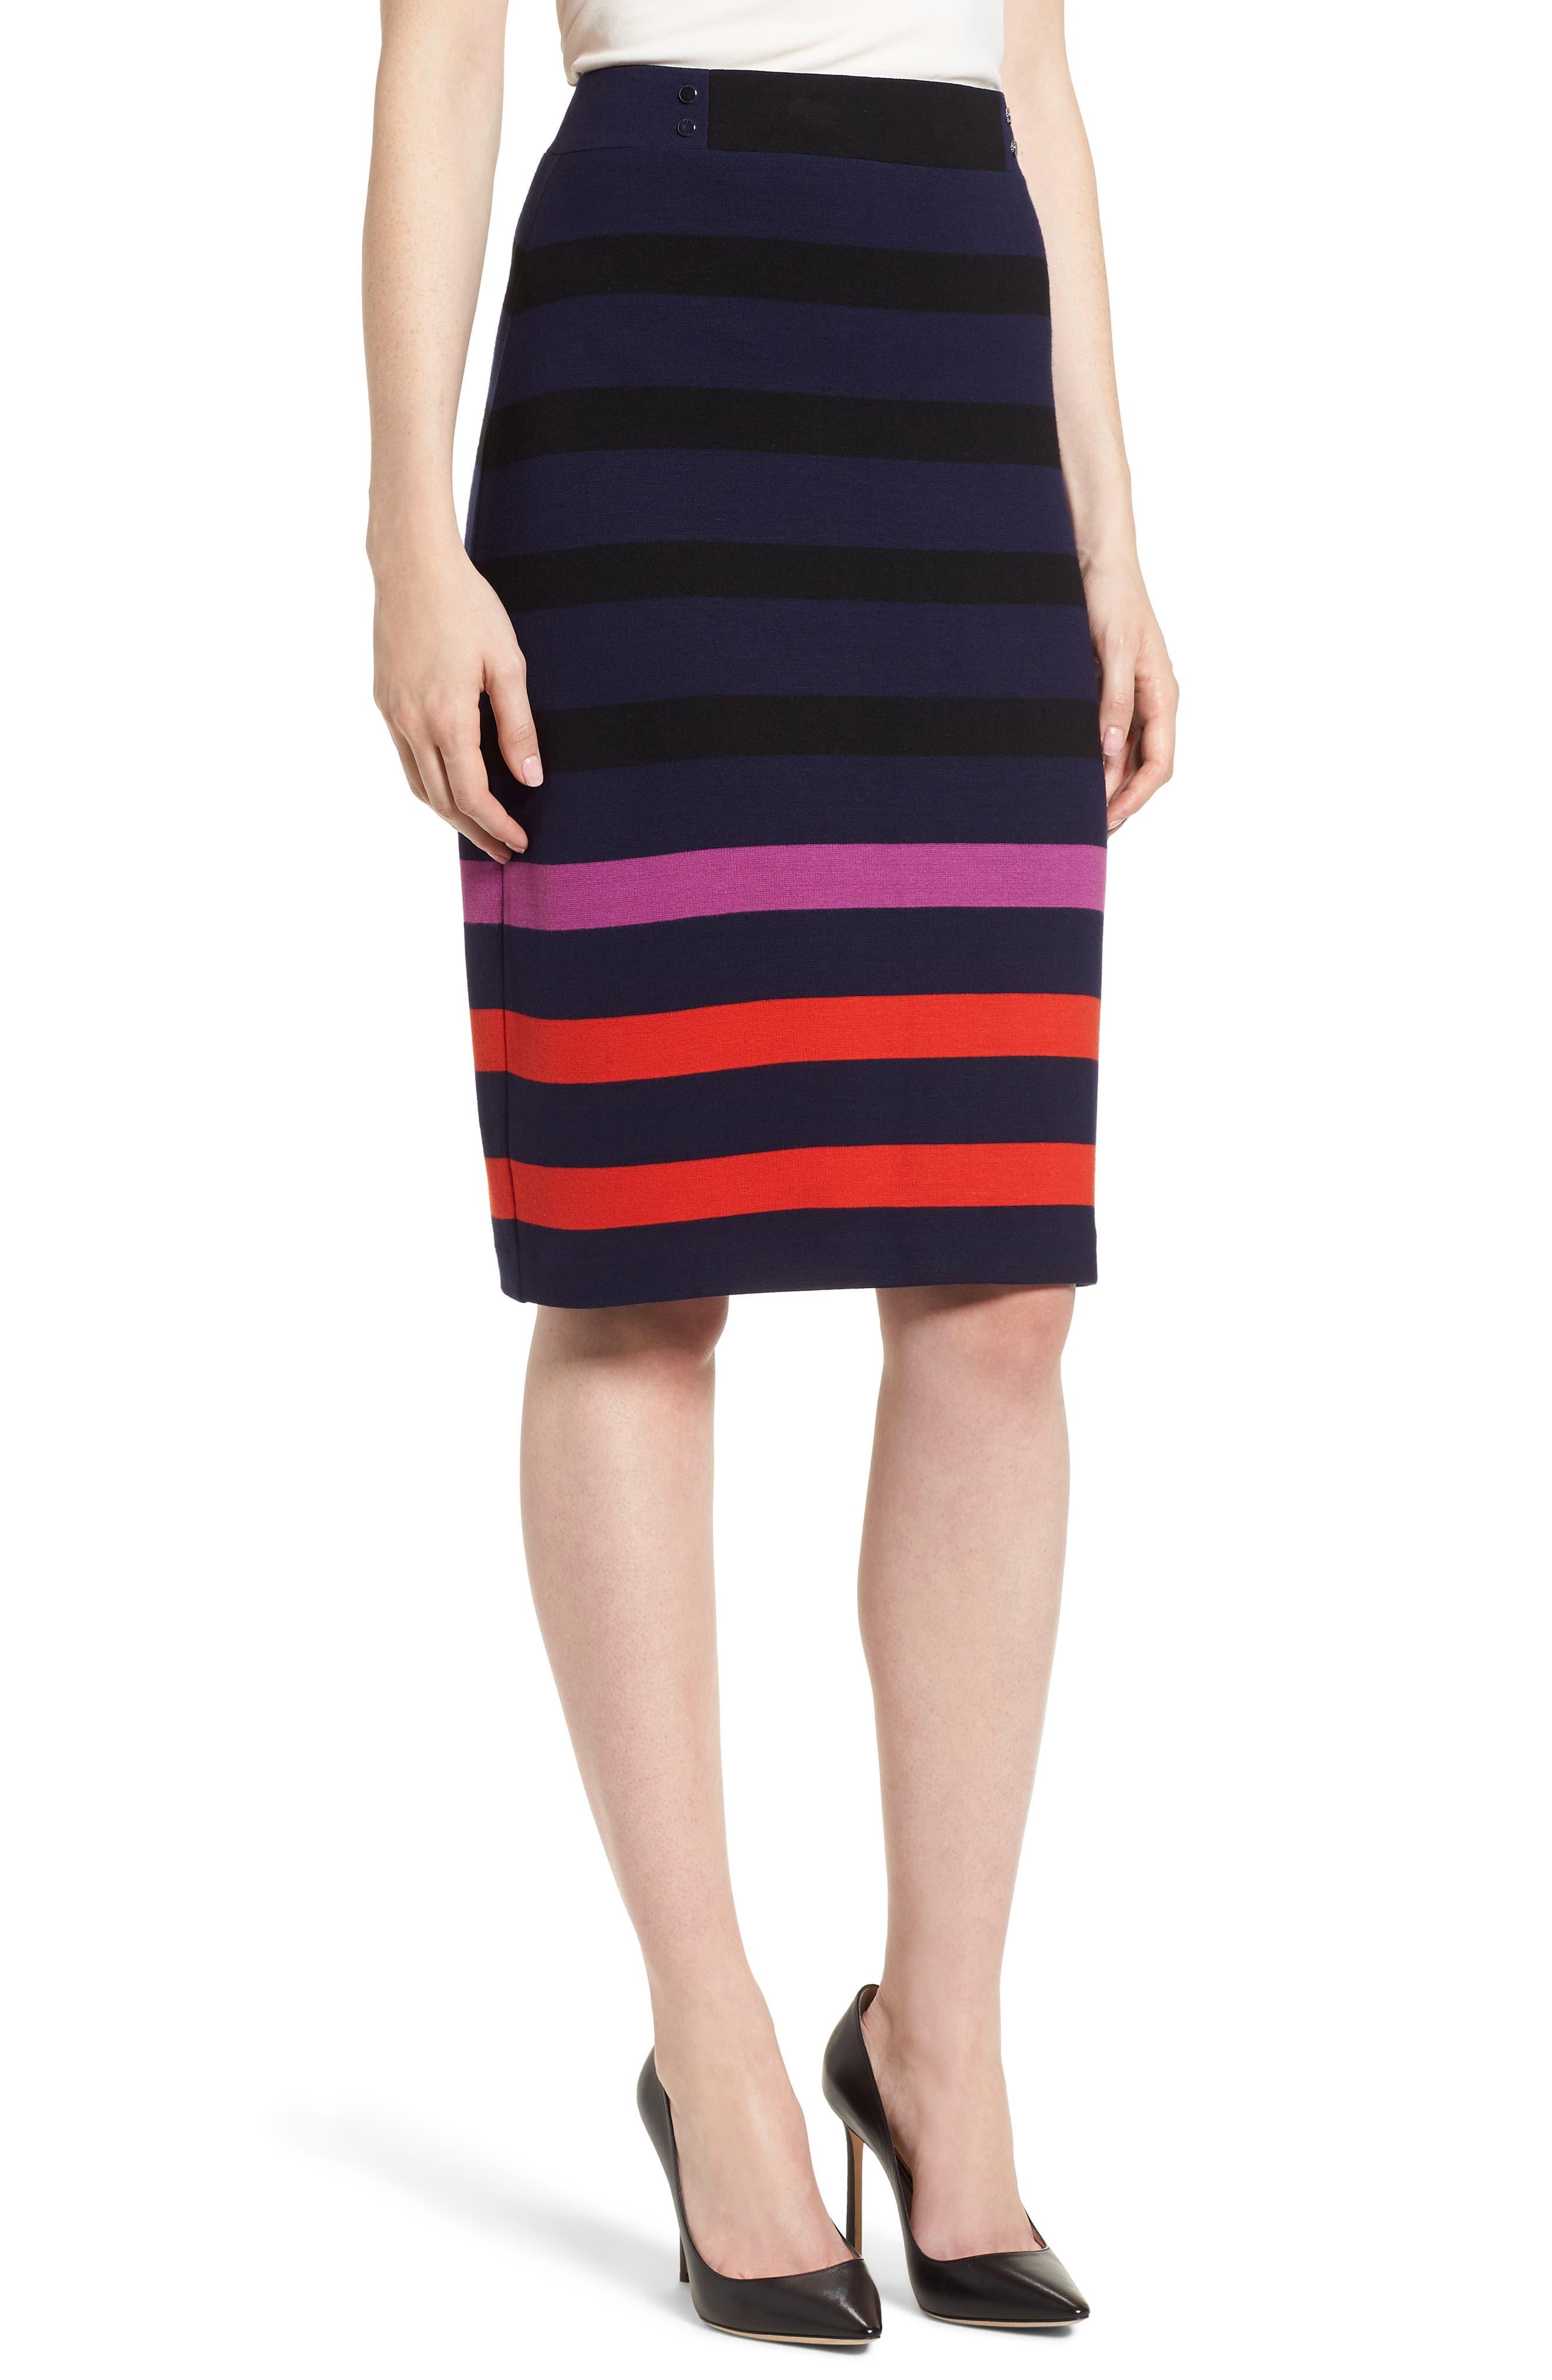 Ebienne Stripe Pencil Skirt,                             Main thumbnail 1, color,                             462